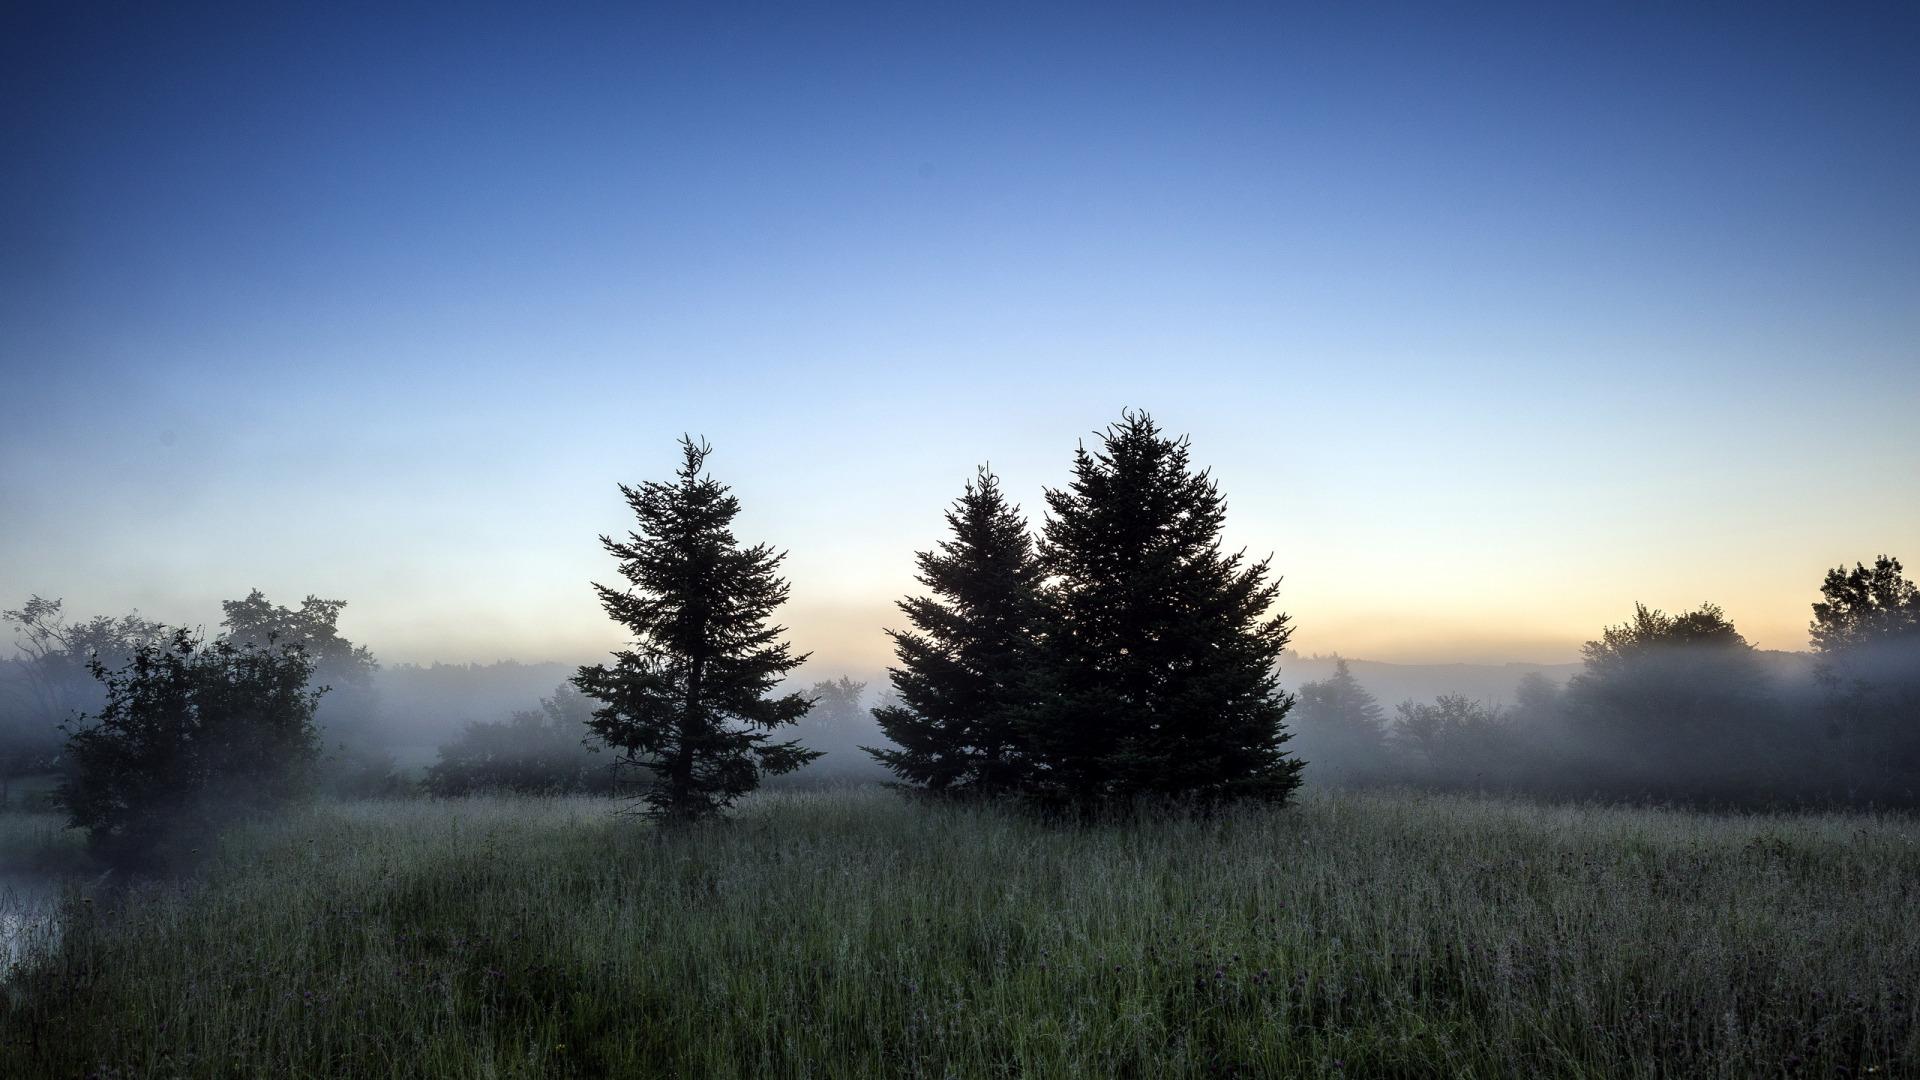 Закат в тумане в лесу  № 1140046 бесплатно